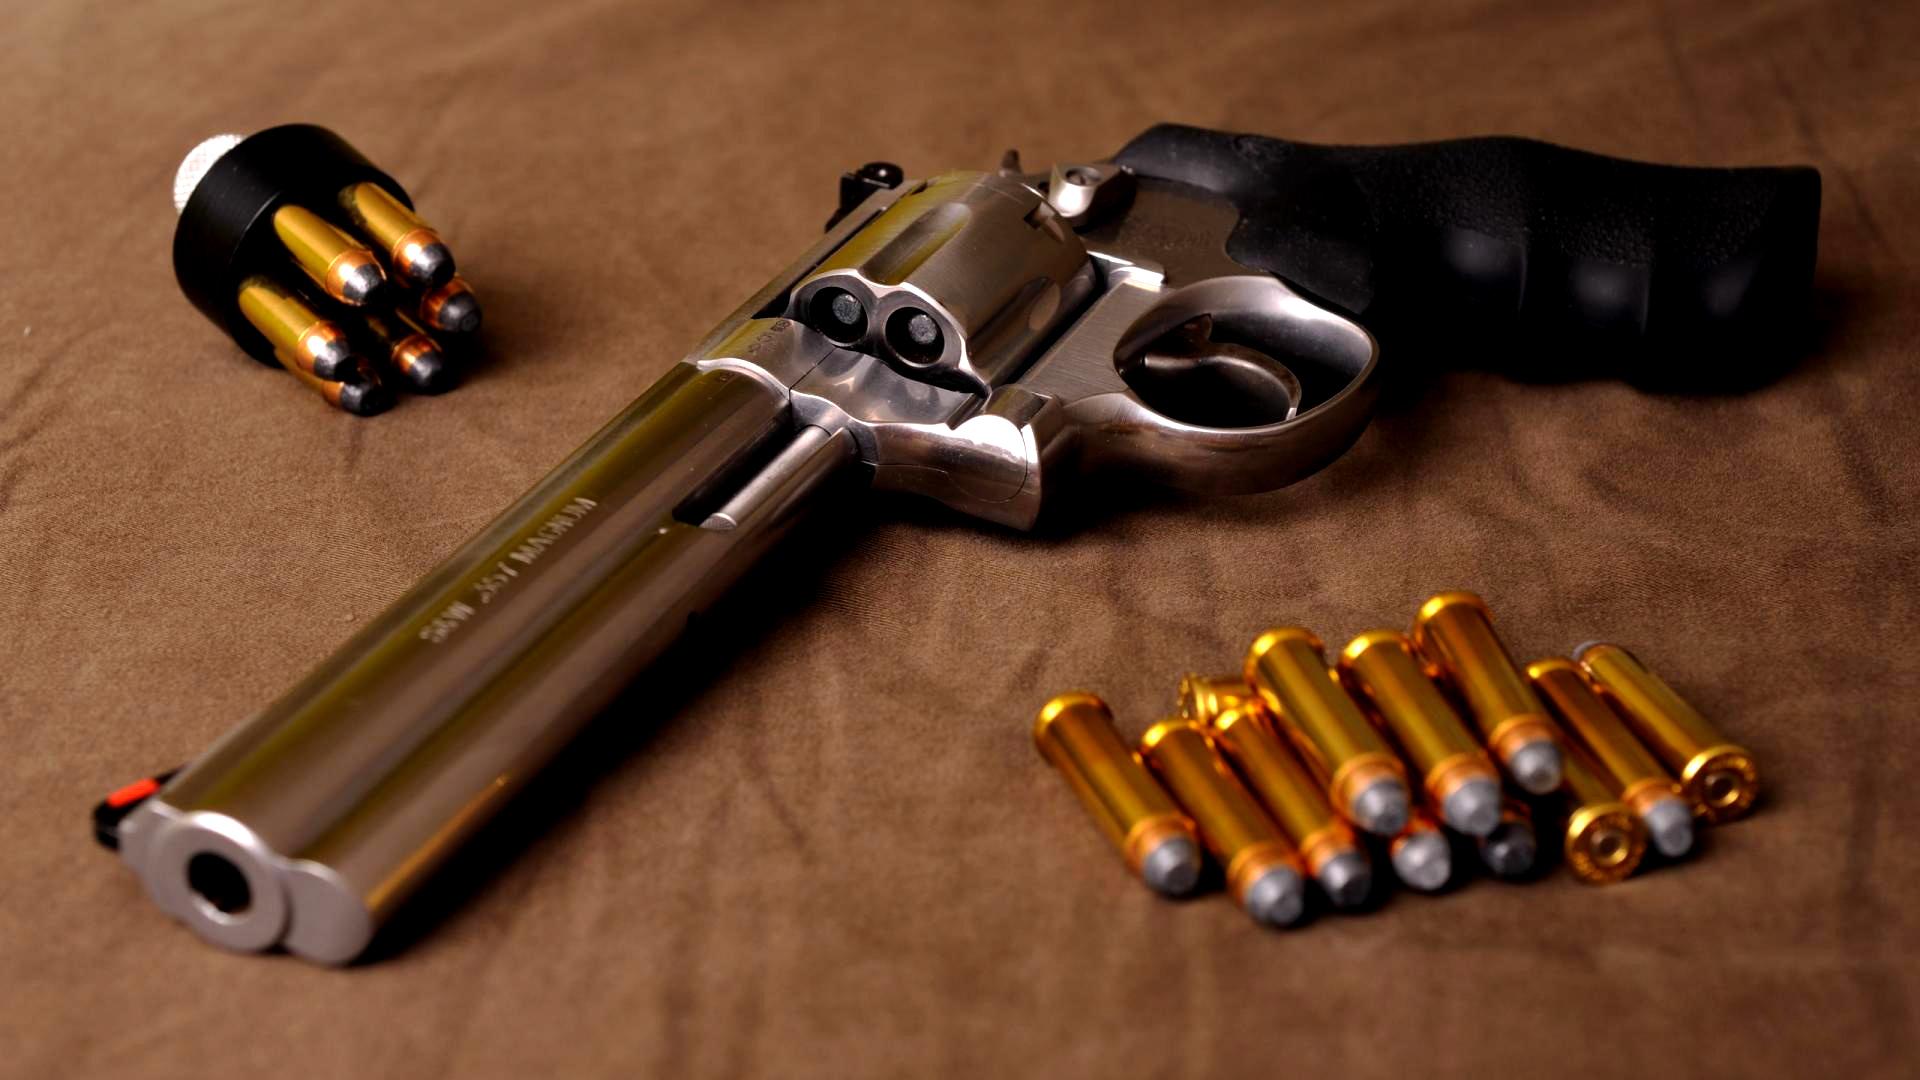 Smith Wesson Revolver Ammunition Weapons Ammo Weapon Gun Pistol Wallpaper